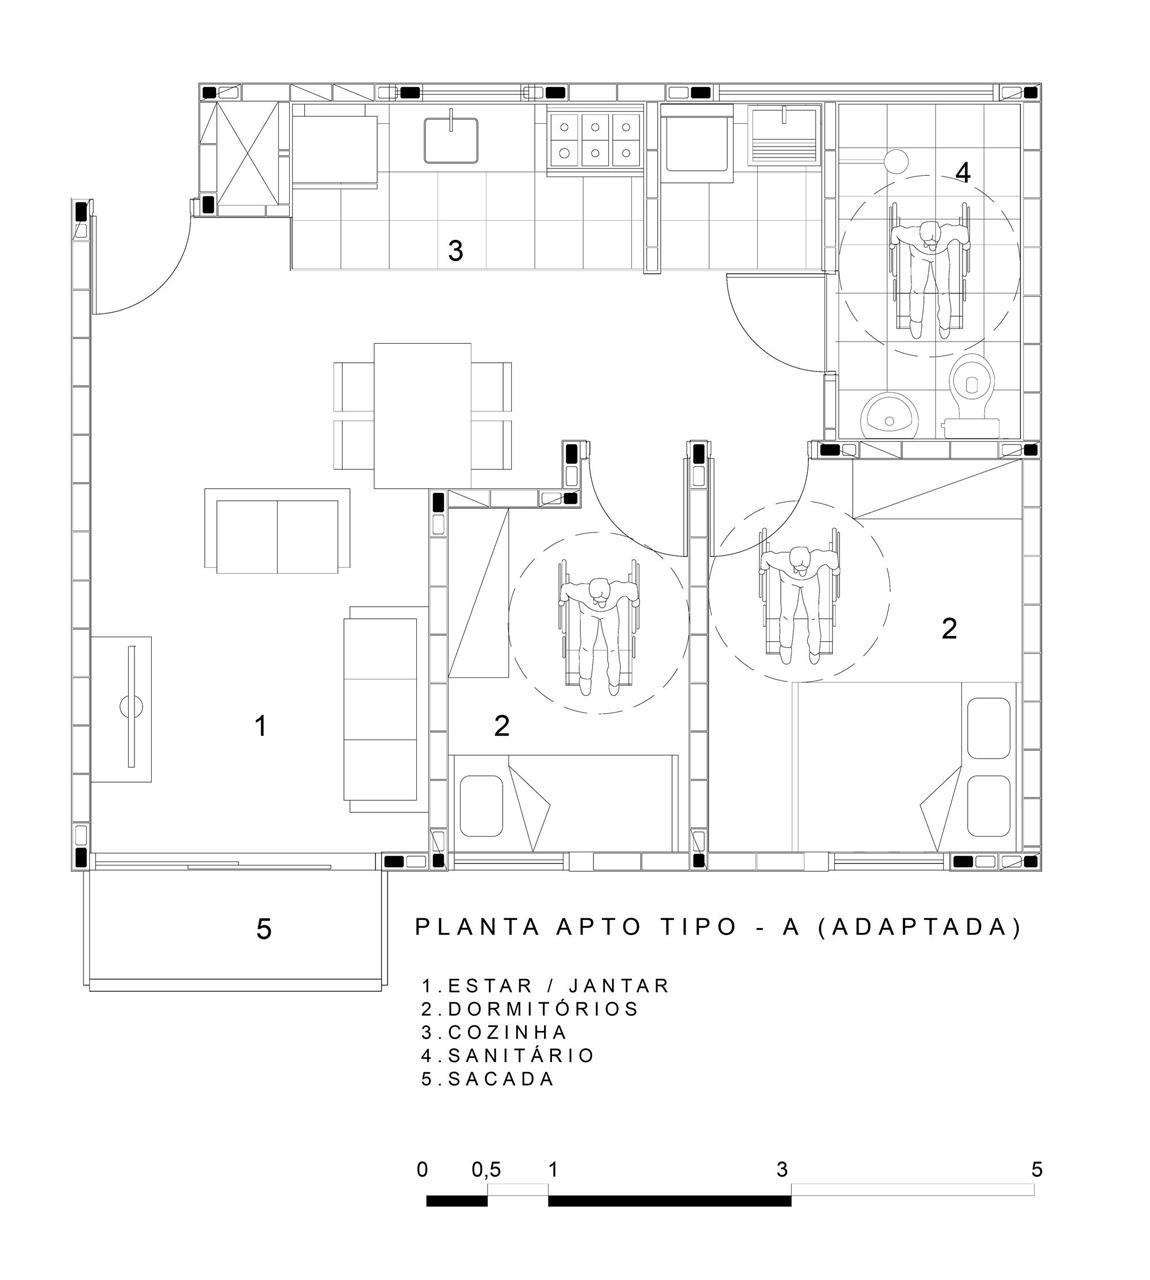 HIS Conjunto Heliópolis Gleba G / Biselli   Katchborian Arquitetos  #202020 1150 1280